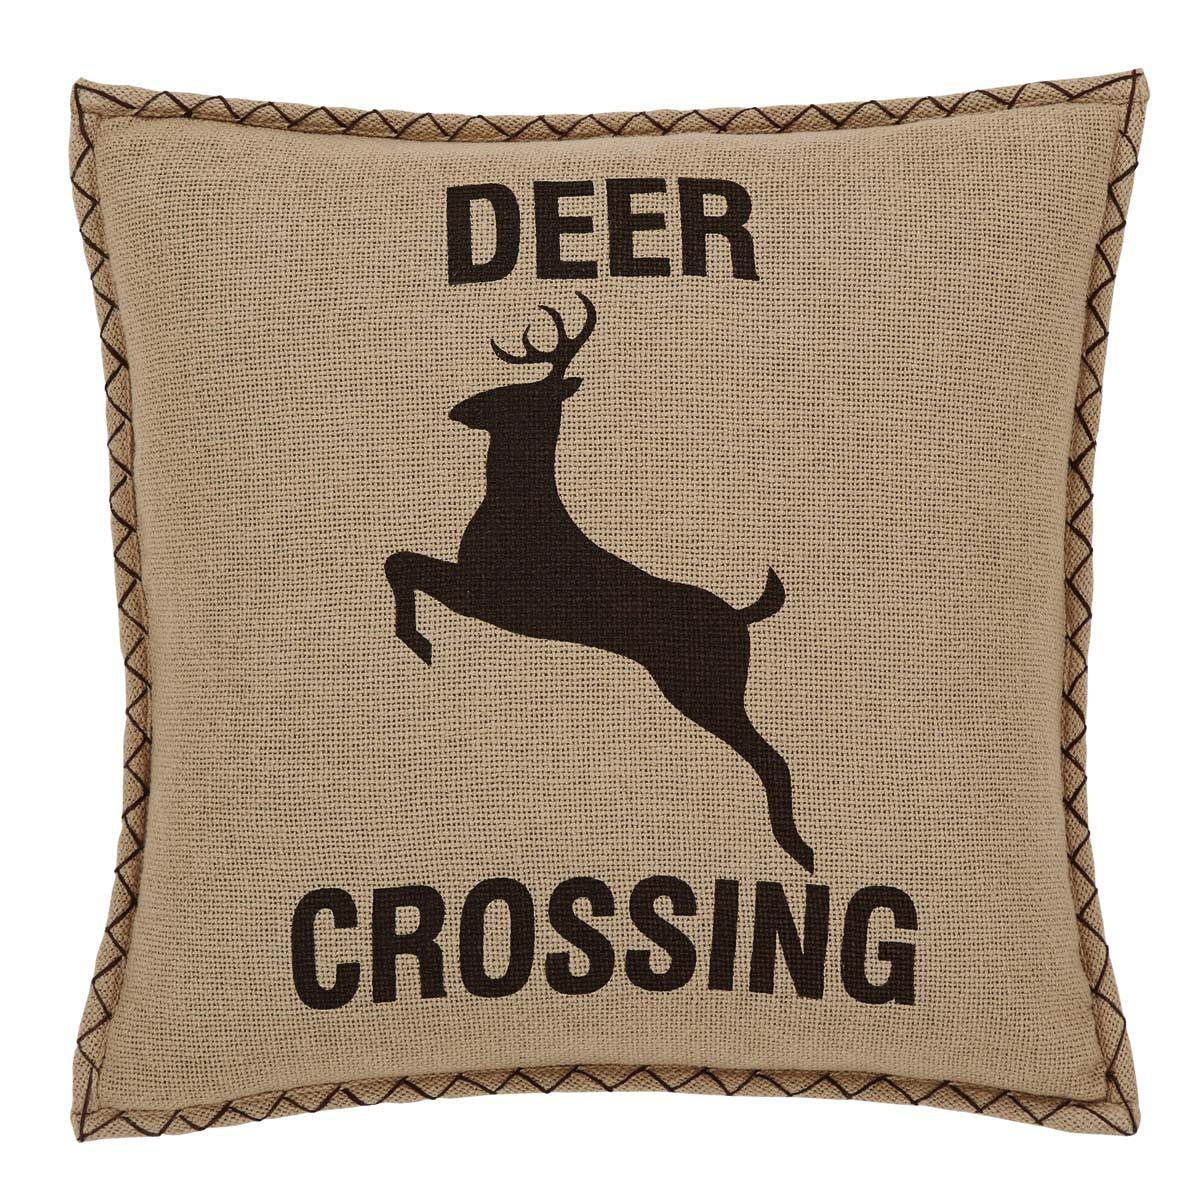 Dawson Star Deer Crossing Pillow Cover 18x18